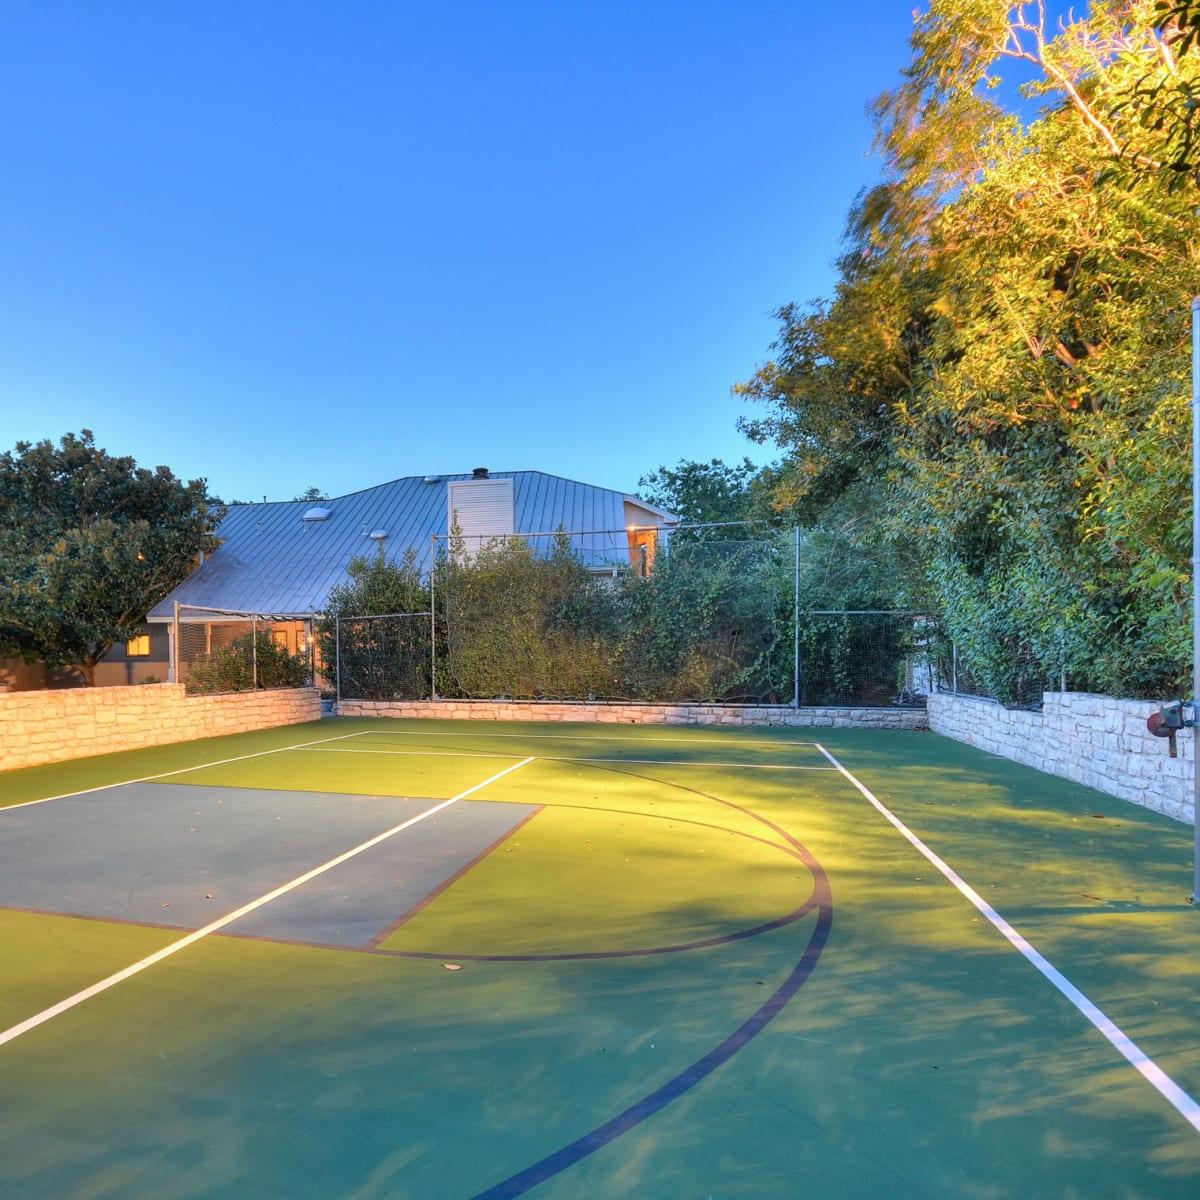 5 Muir Lane Austin house for sale sport court